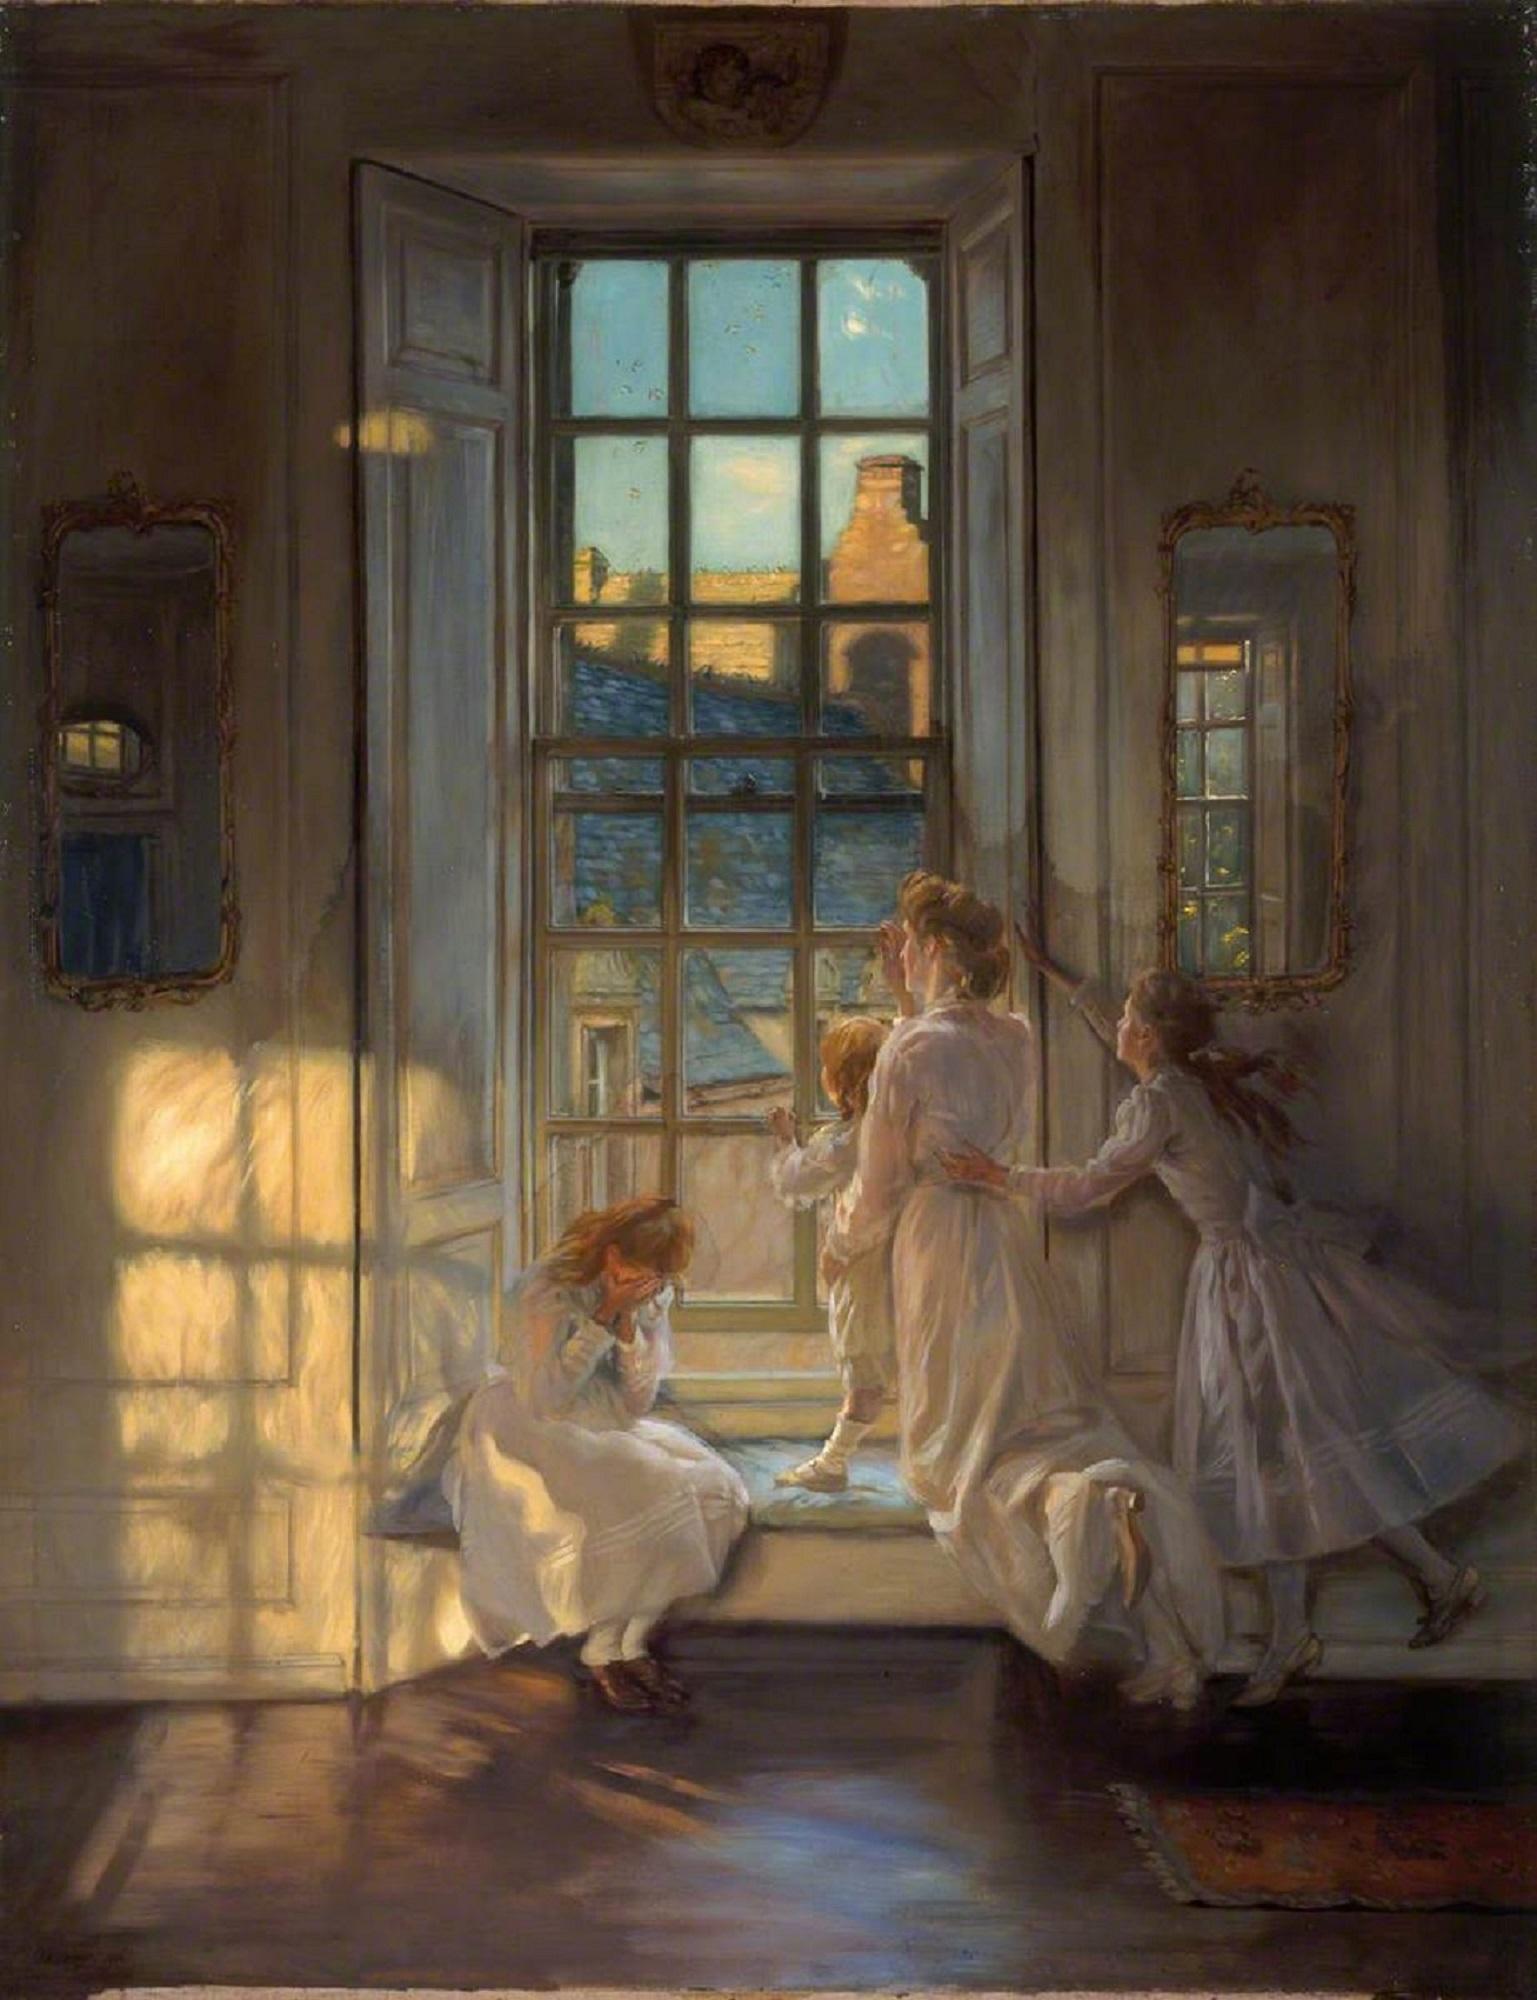 John Henry Lorimer, Flight of the Swallows, oil on canvas, 1906. Museums & Galleries Edinburgh, City Art Centre